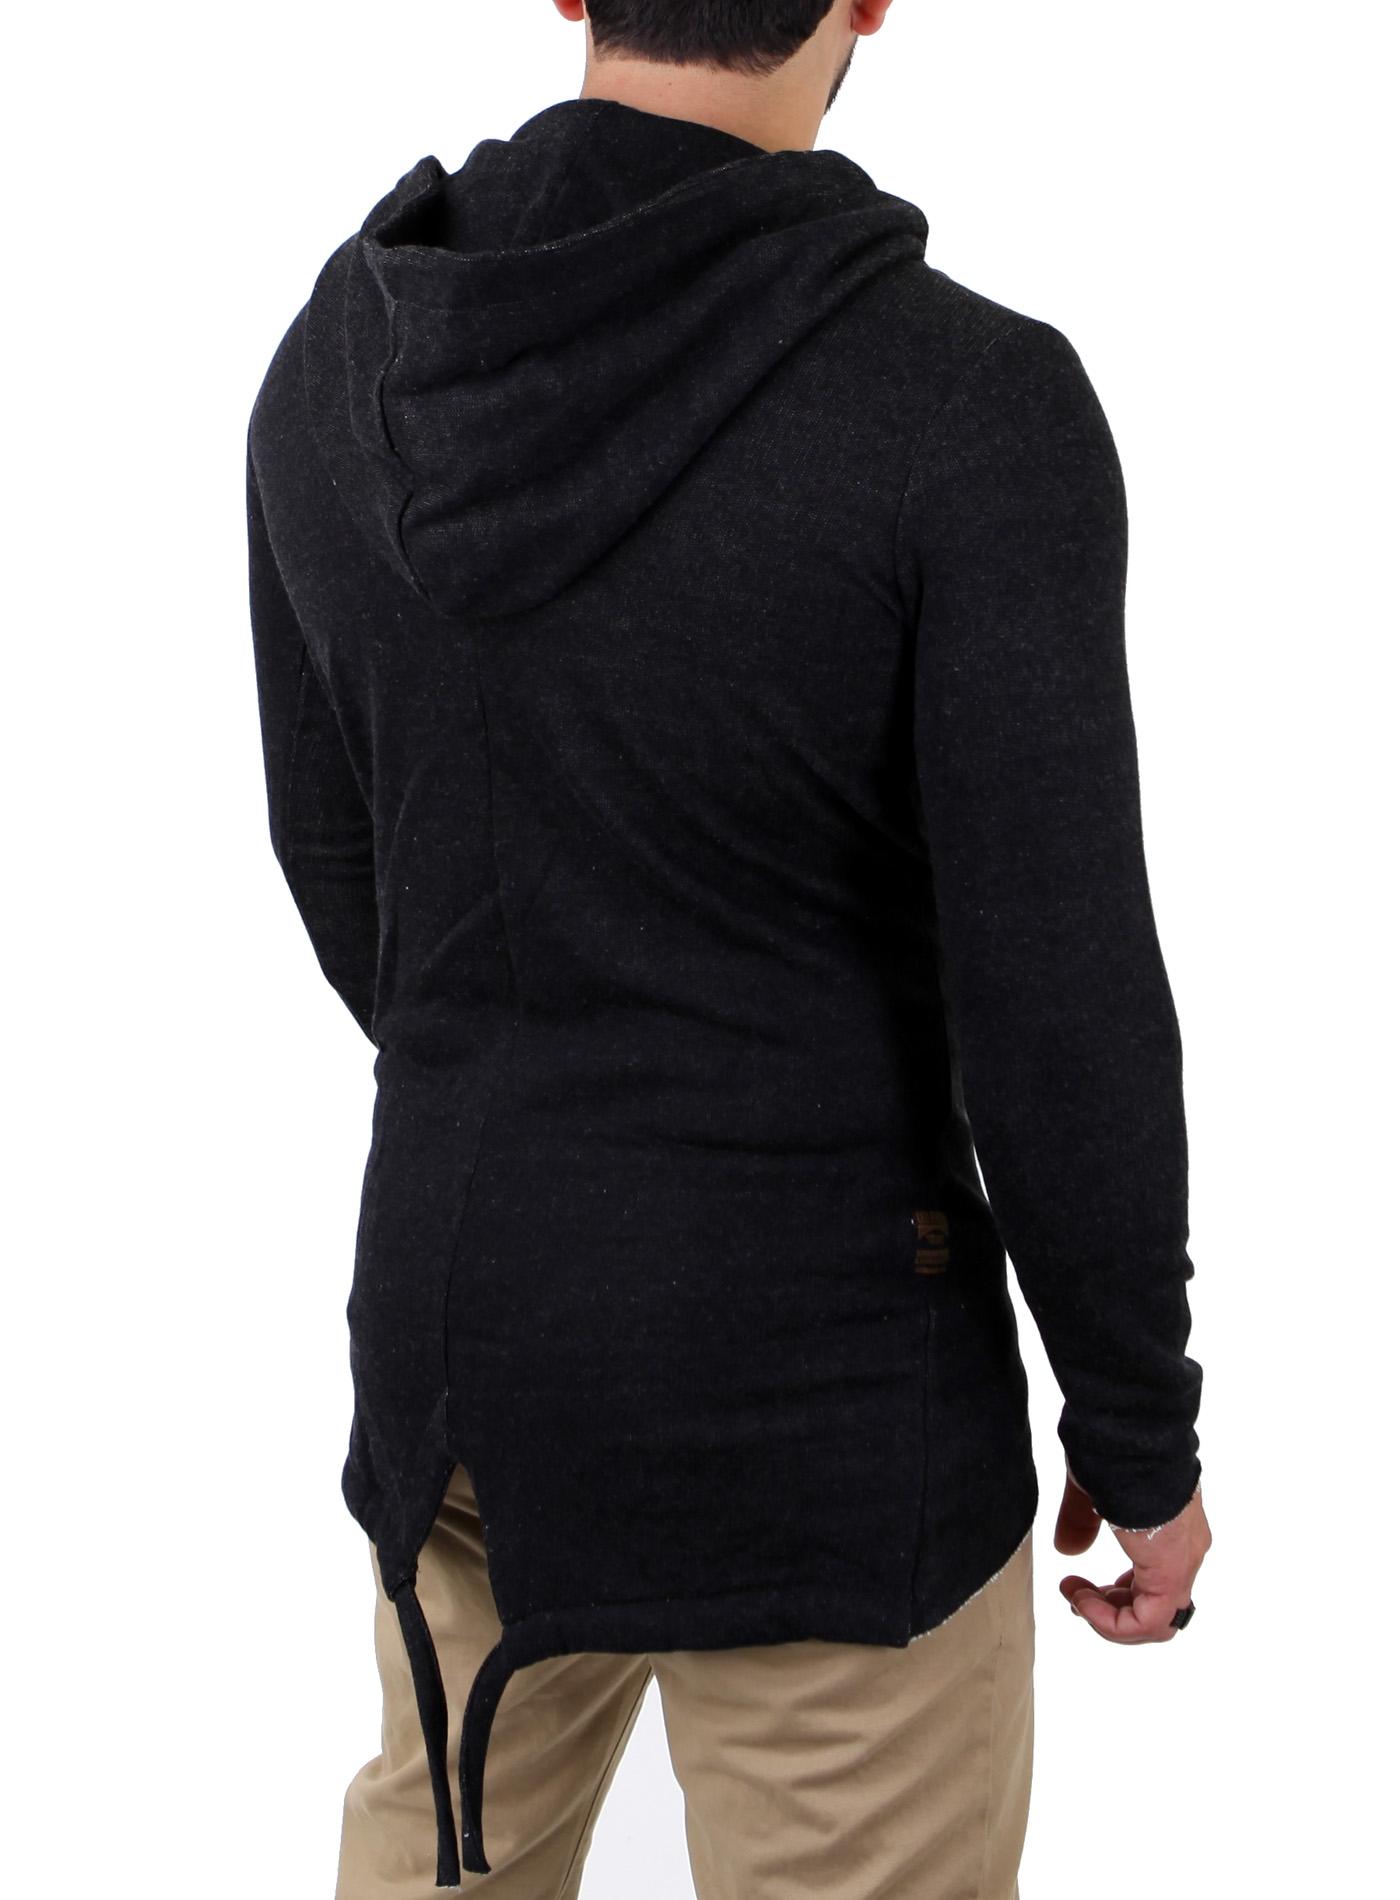 redbridge herren oversize zipper cardigan lang strick jacke pullover hoody 41354 ebay. Black Bedroom Furniture Sets. Home Design Ideas